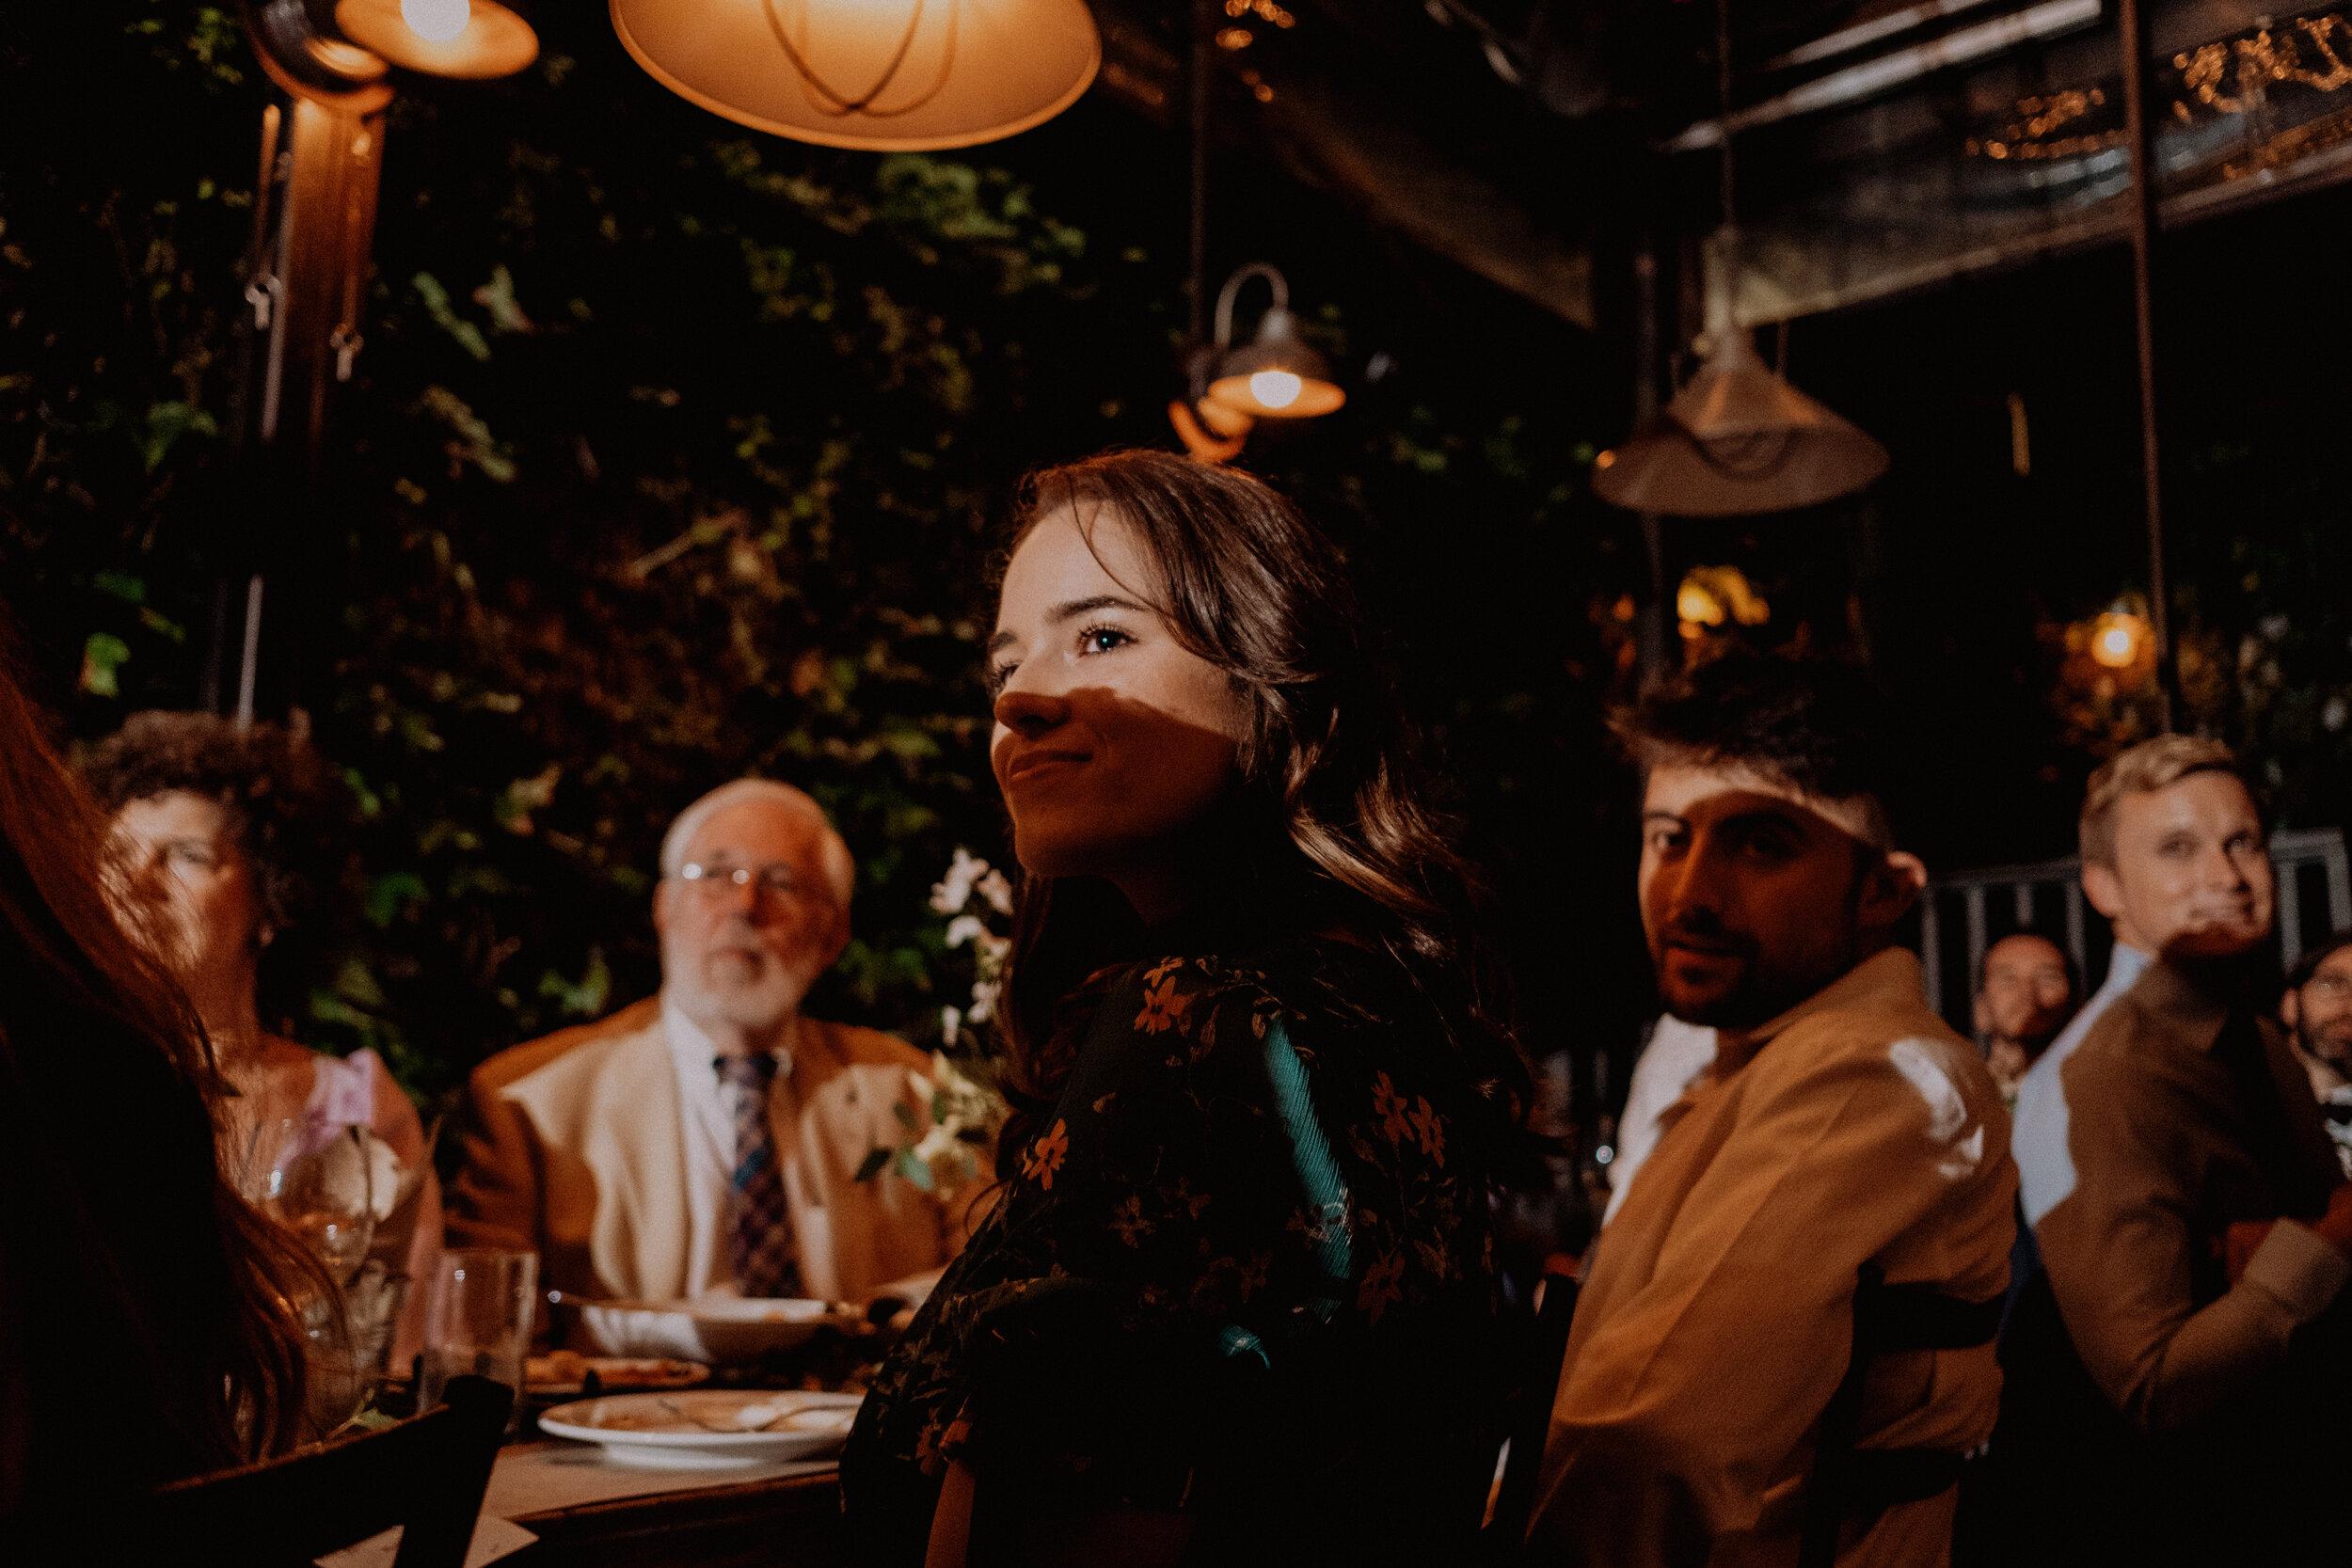 Aurora_Brooklyn_Wedding_Photographer_Chellise_Michael_Photography-508.jpg